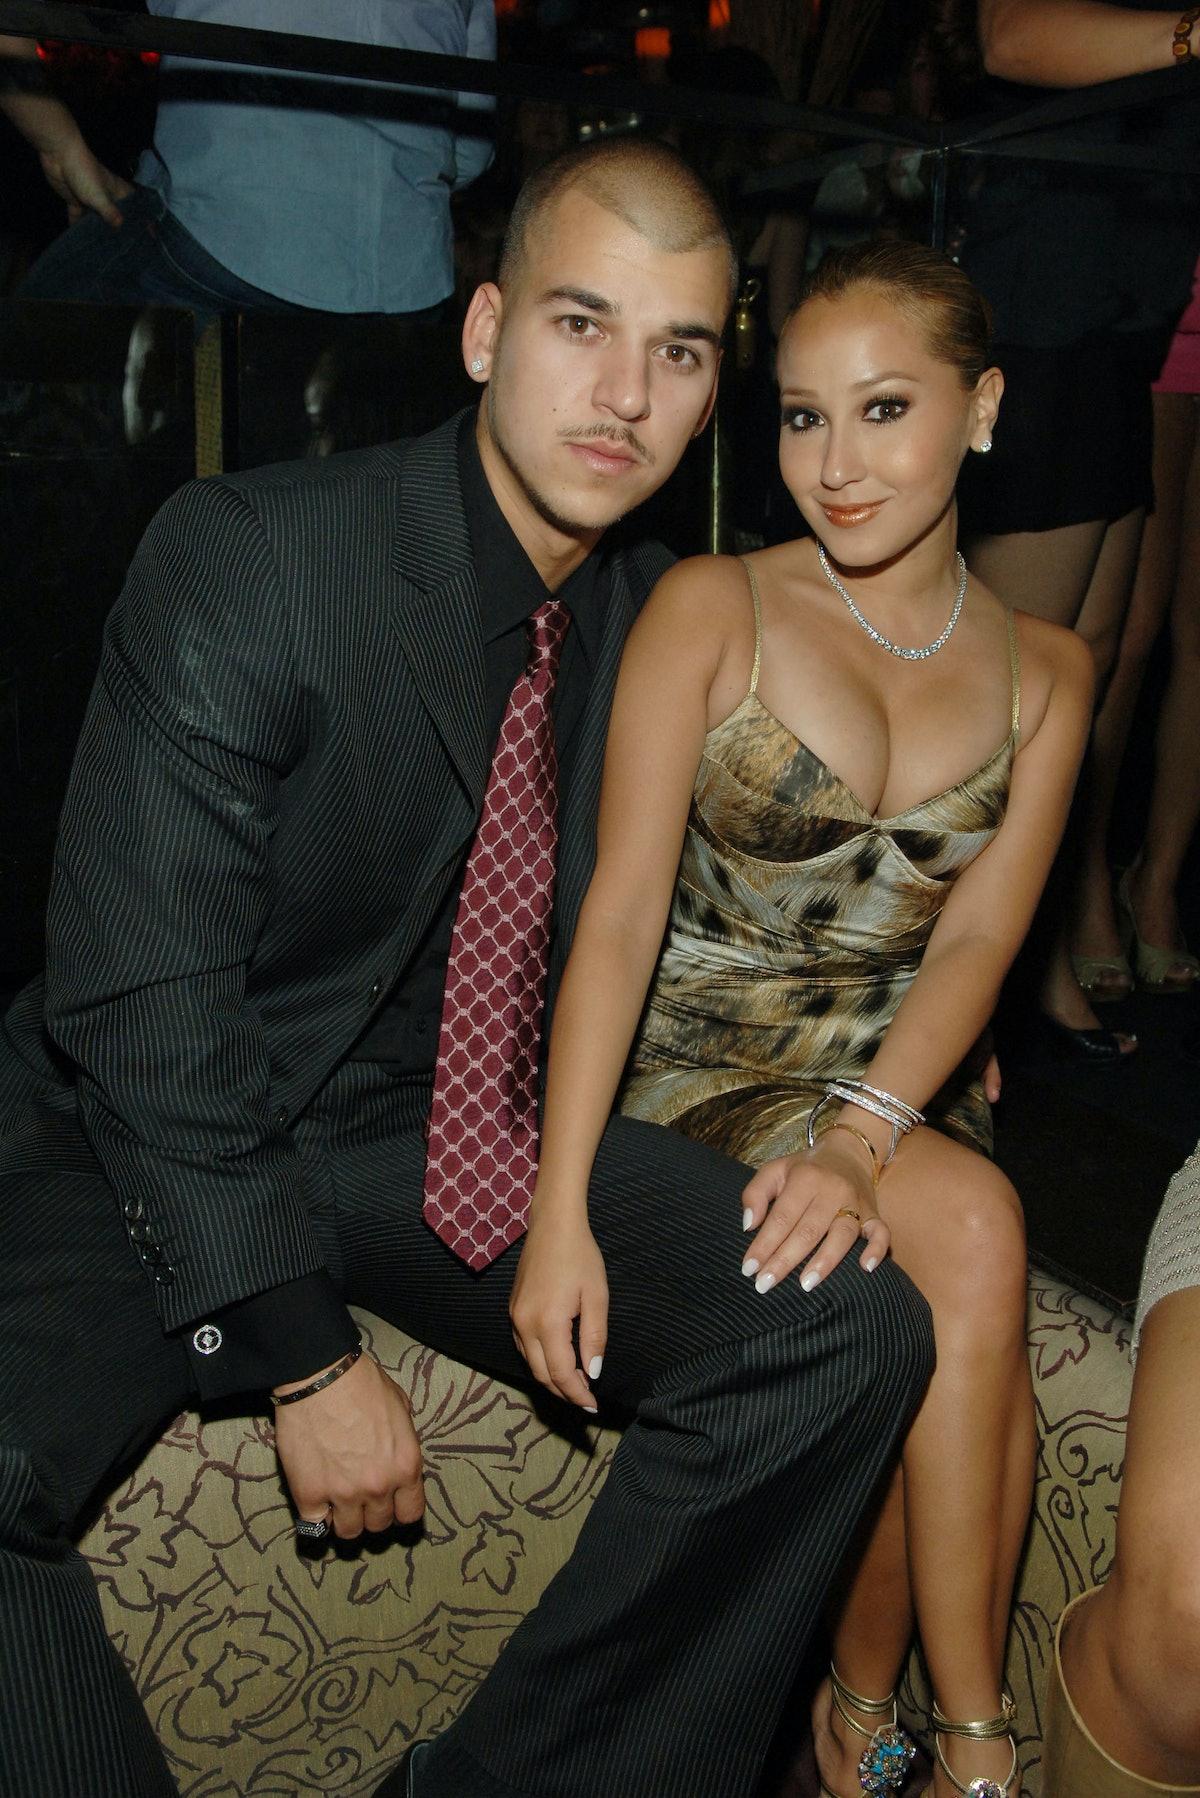 Rob Kardashian and Adrienne Bailon pose for a photo.